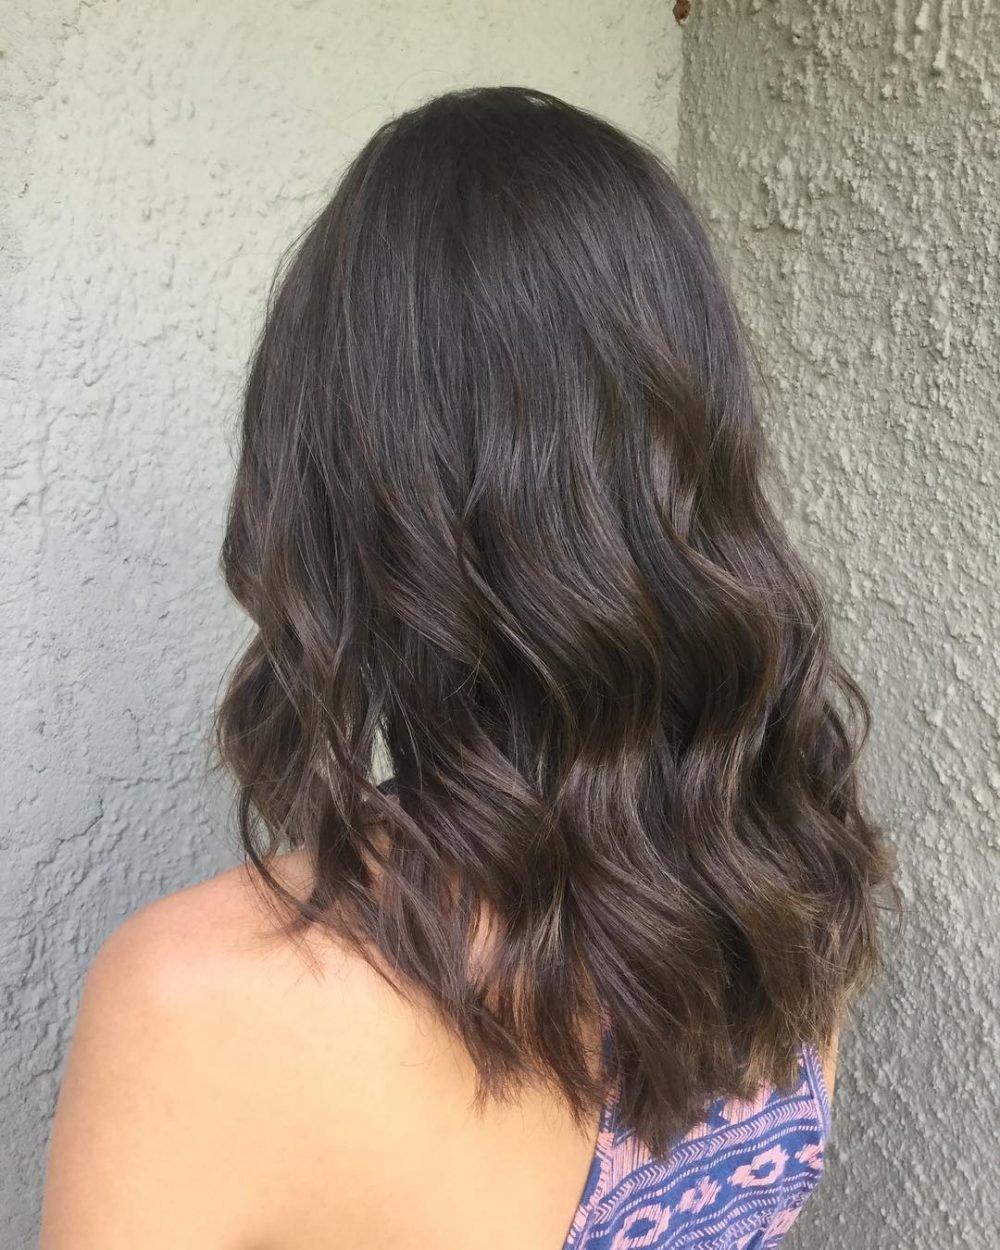 Magnificent versatile Lob hairstyle